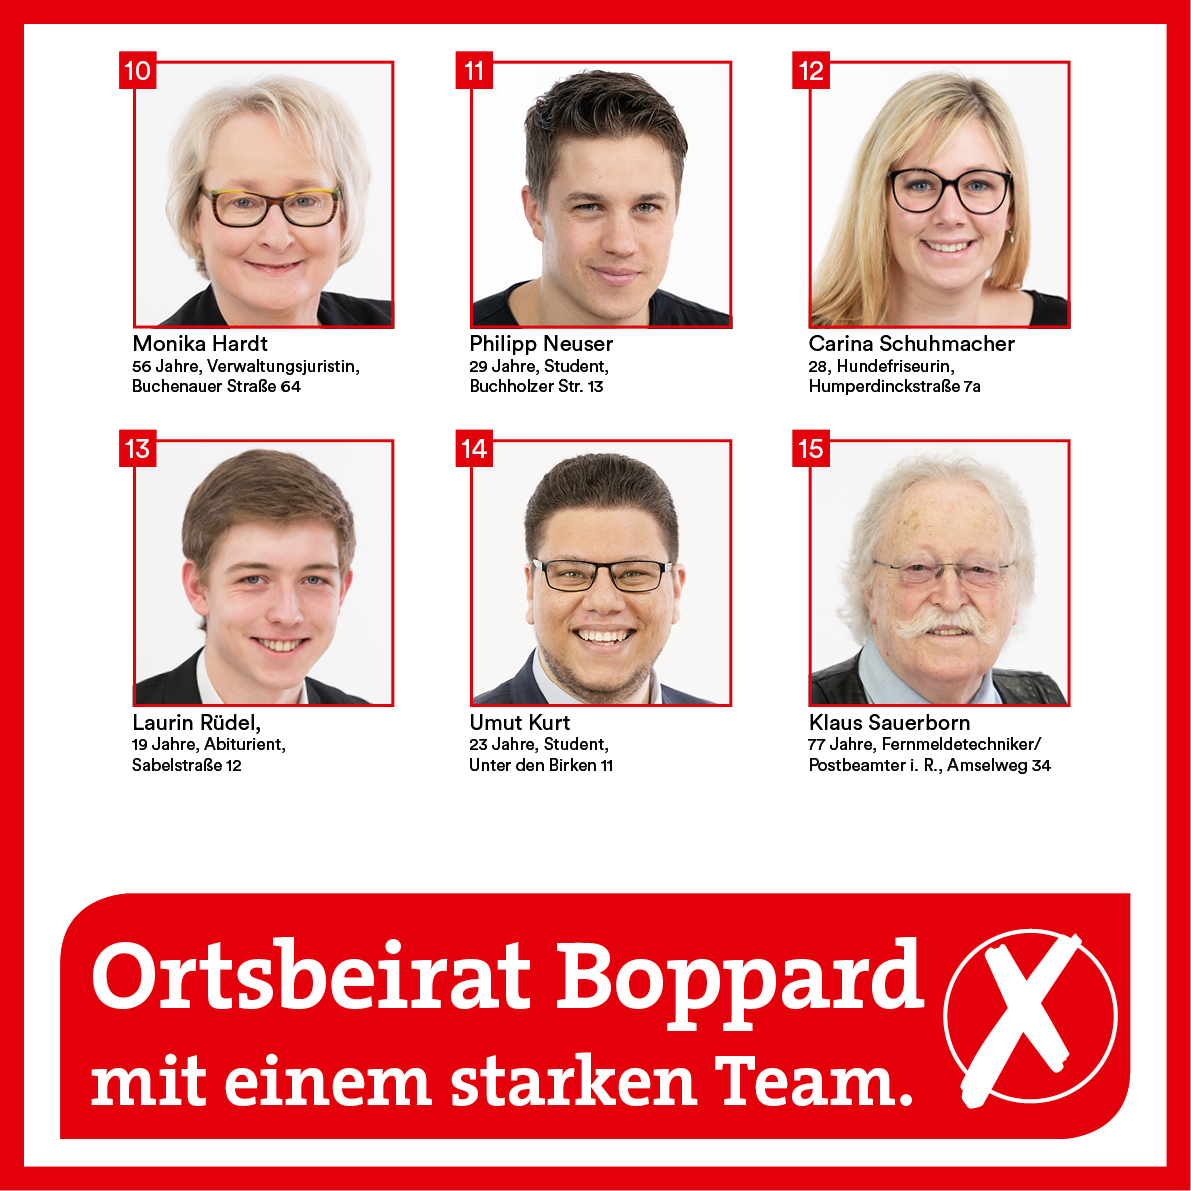 OrtsbeiratBoppard4